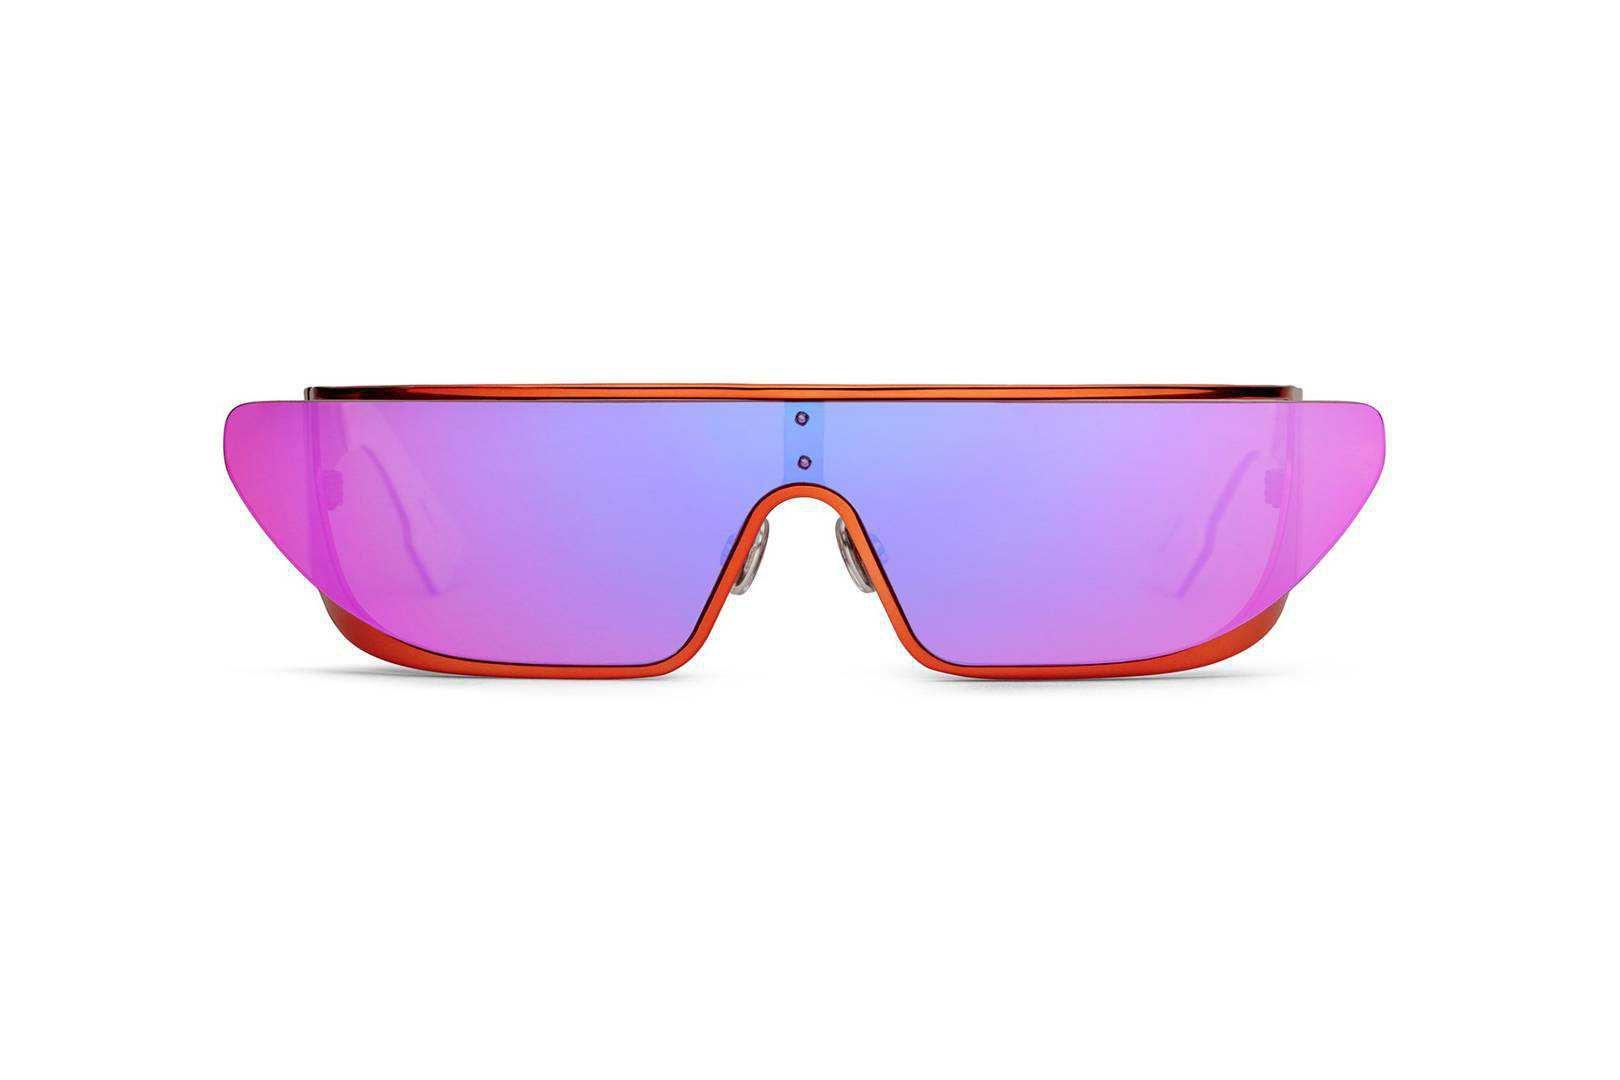 dior and rihanna sunglasses - Recherche Google